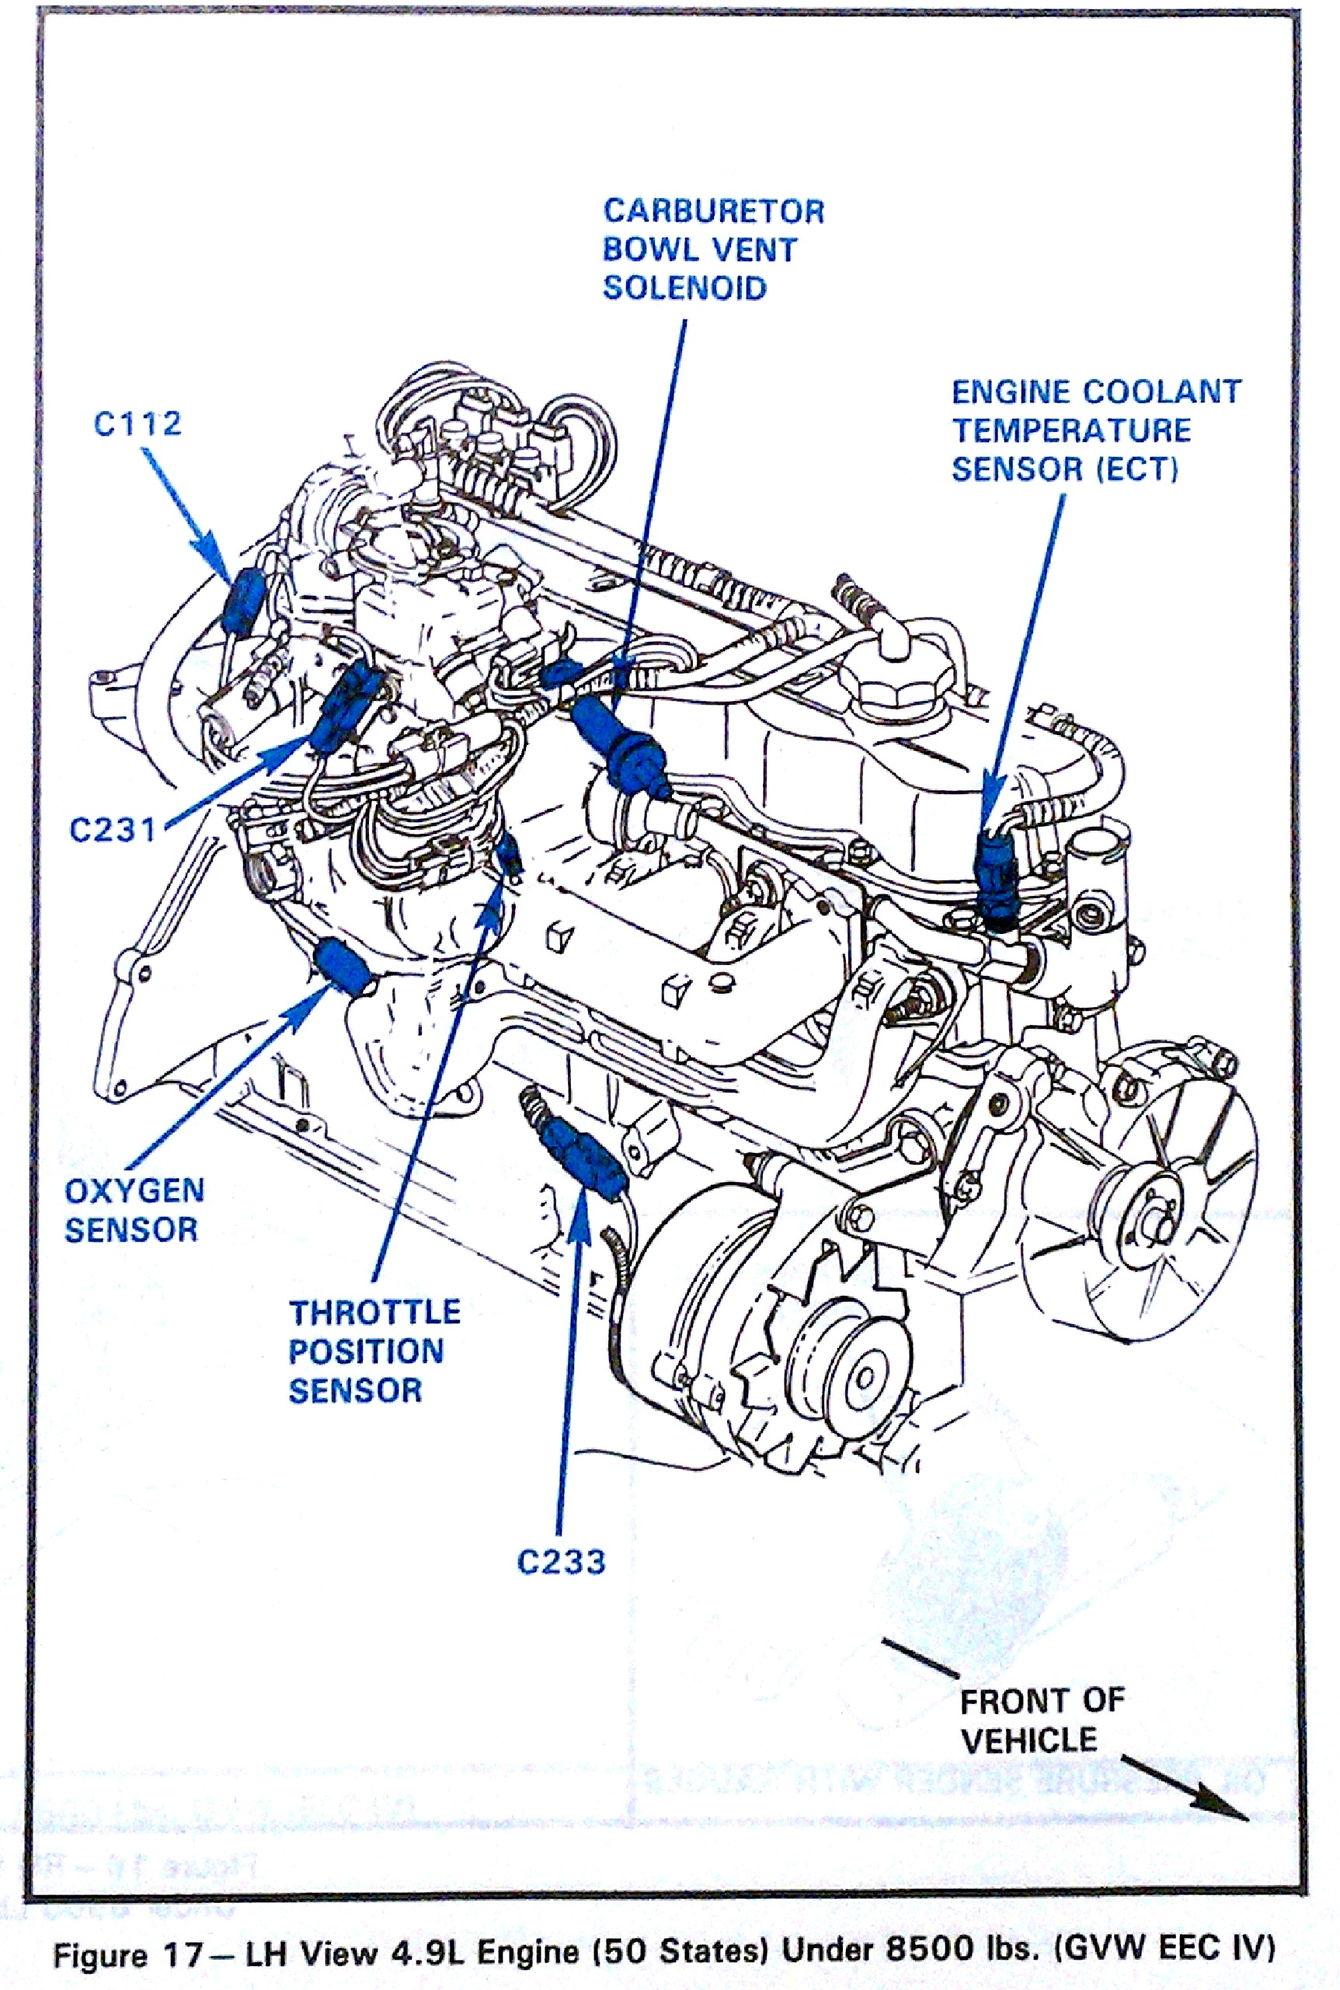 85 f150 wiring diagram visio 2013 uml component 1985 ford truck alternator